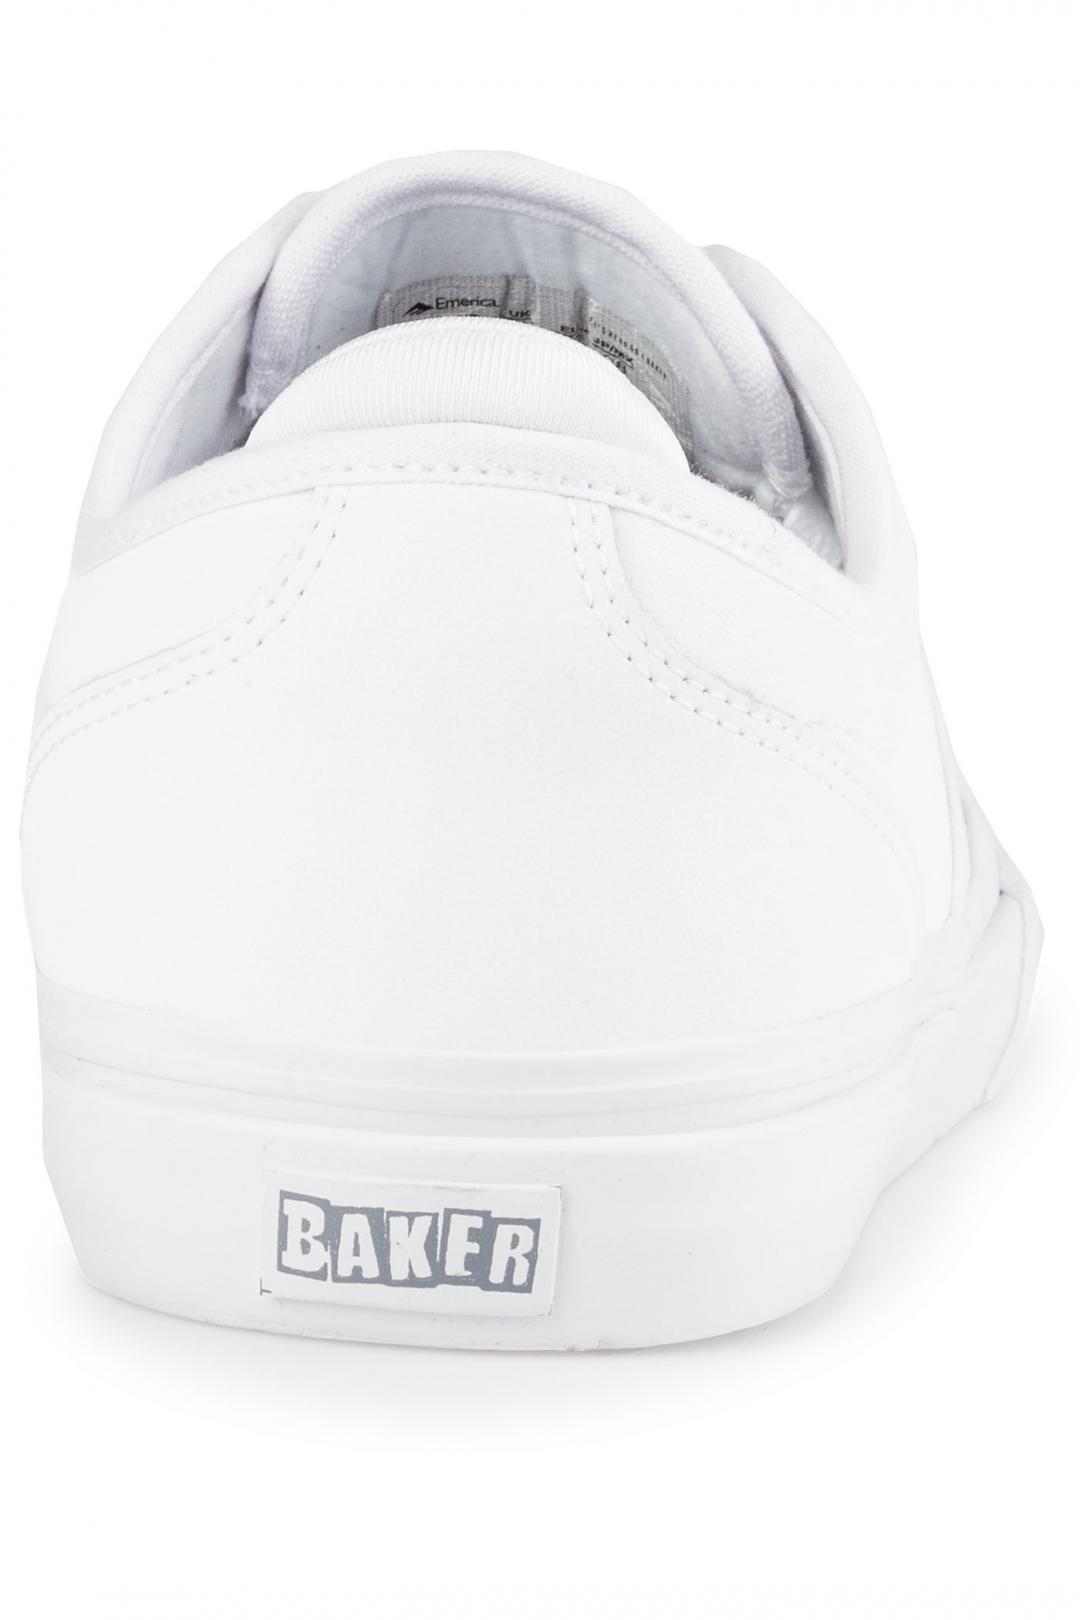 Uomo Emerica x Baker Wino G6 white white | Sneakers low top